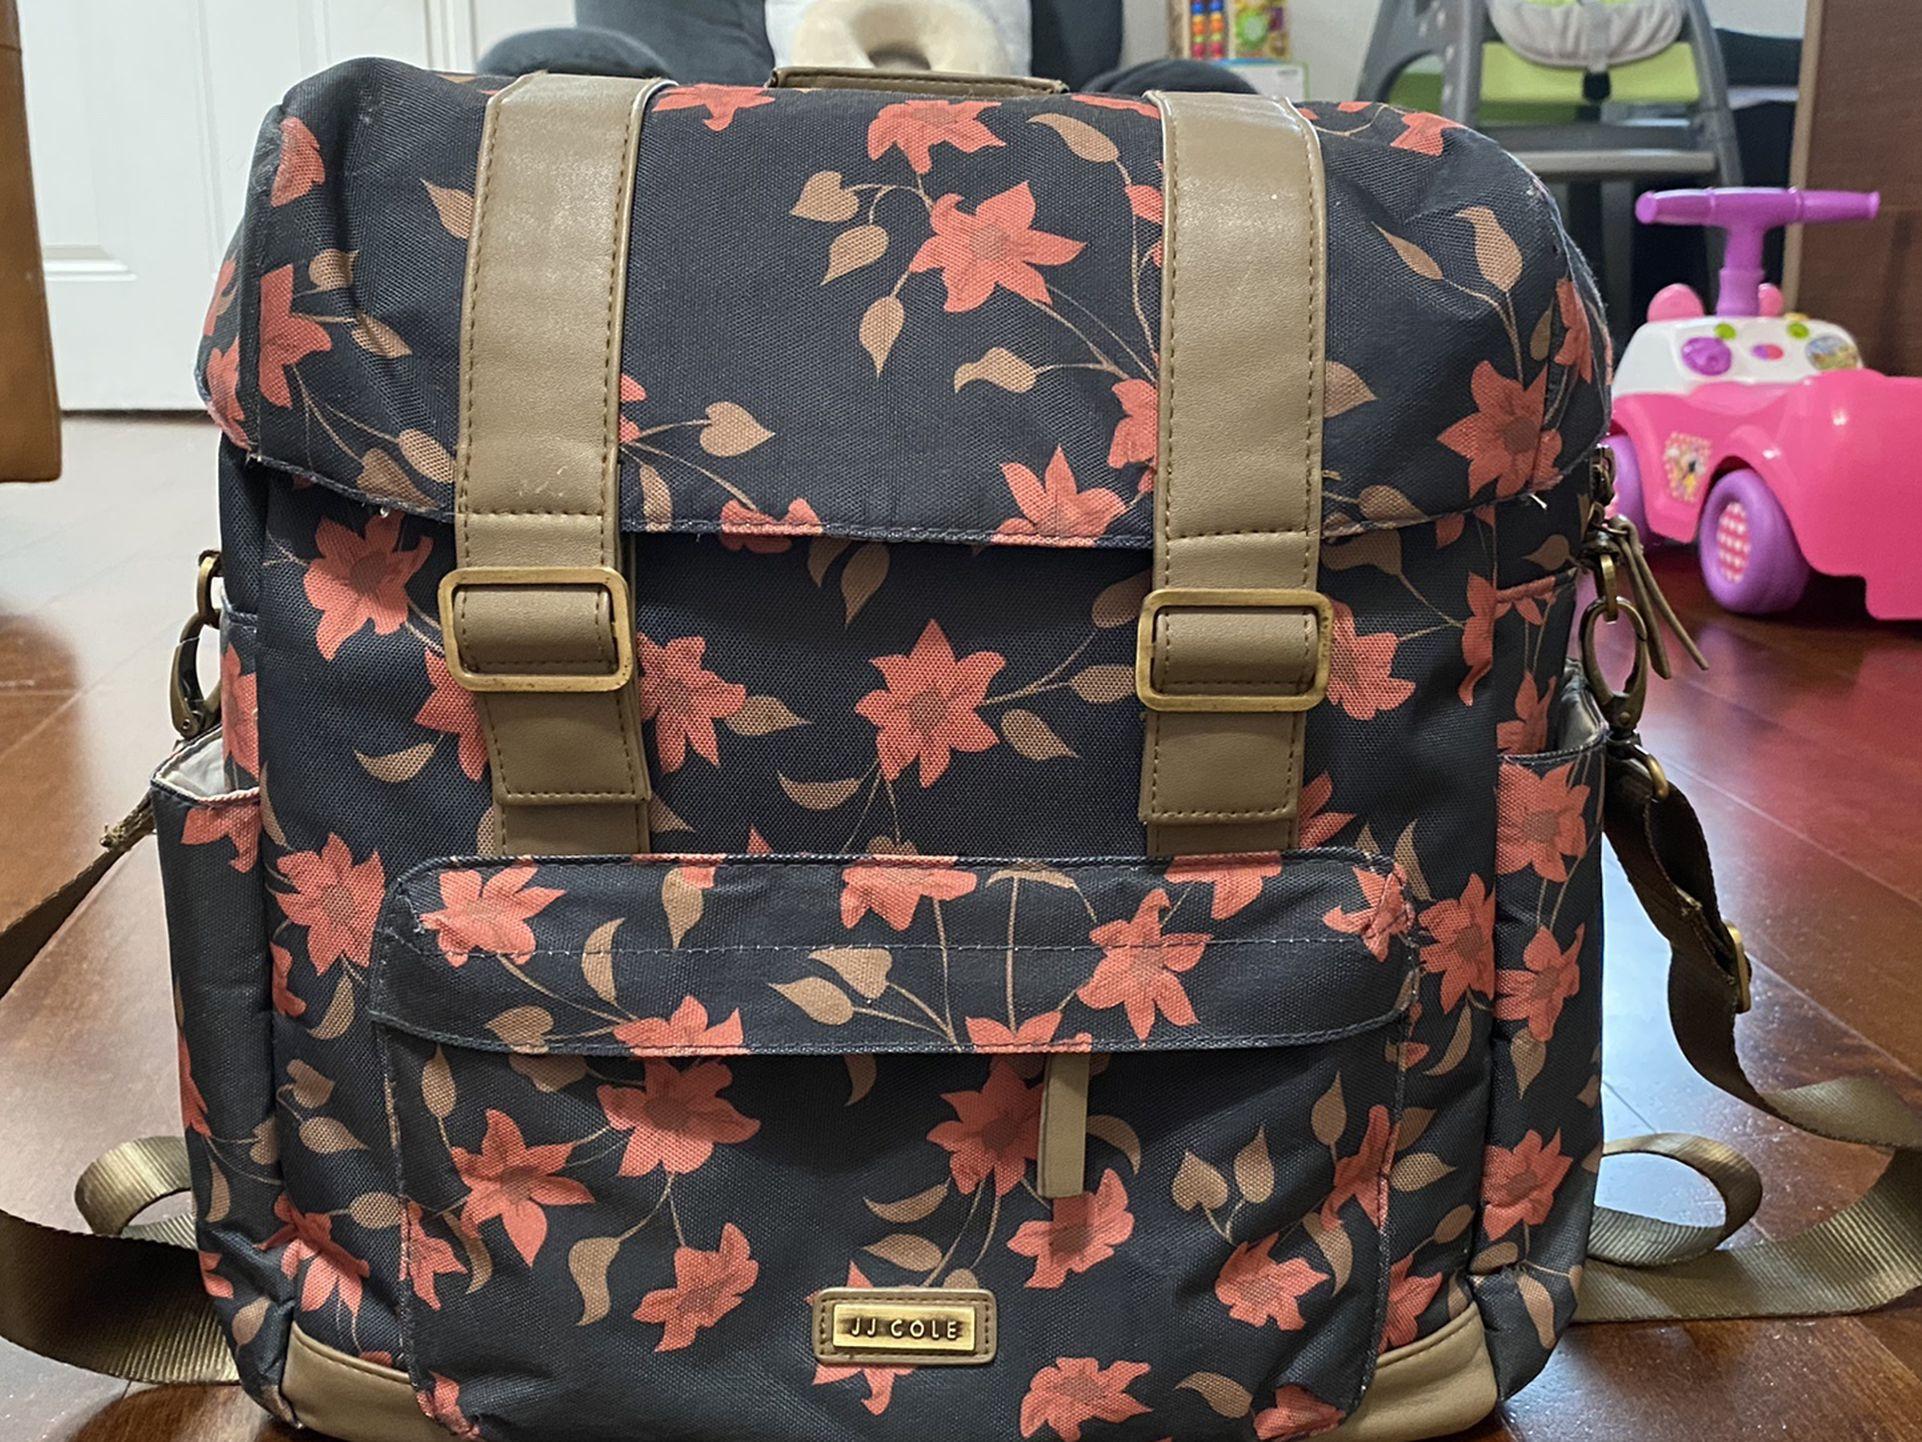 JJ Cole Disper Bag-Floral